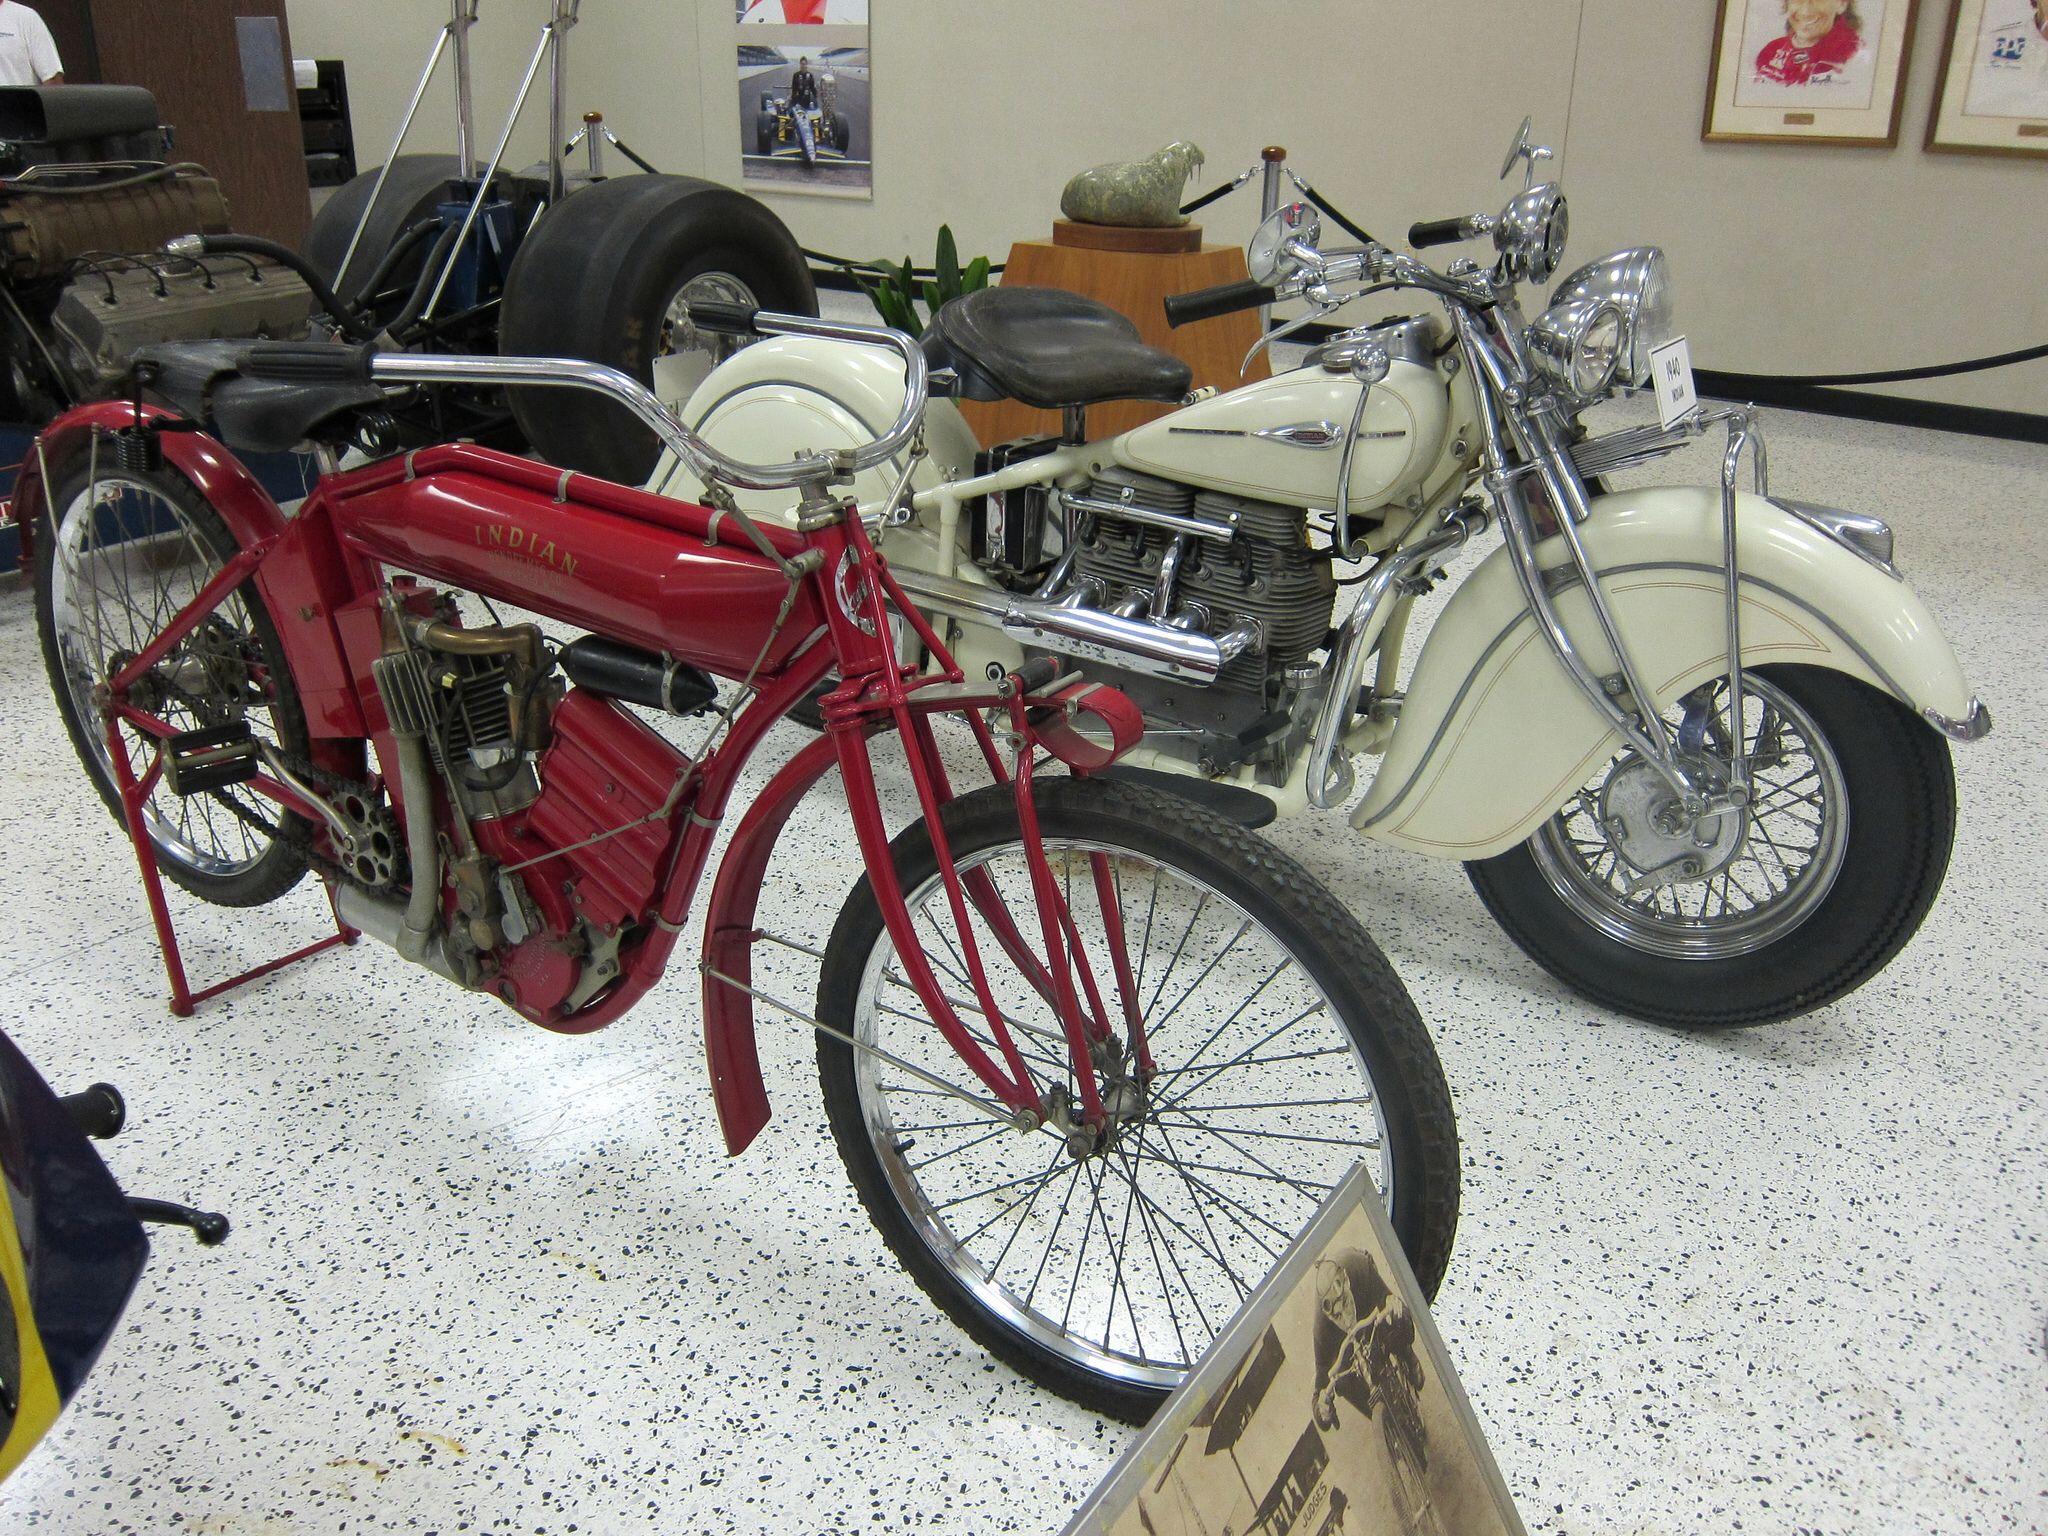 Motorbikes at Indianapolis Motor Speedway Museum | Open wheel racing ...